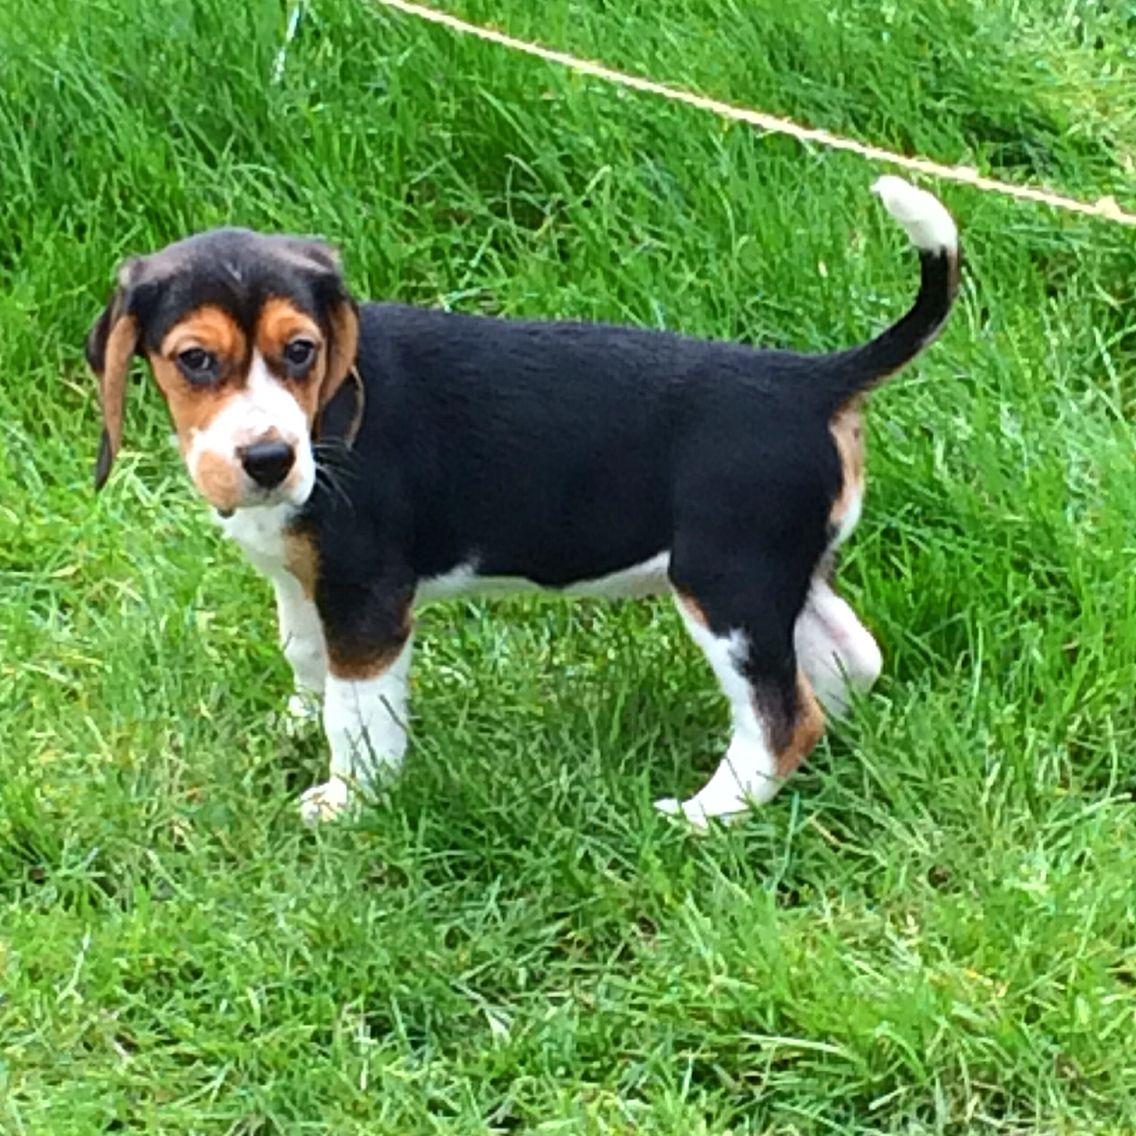 10 weeks old beagle puppy Pika